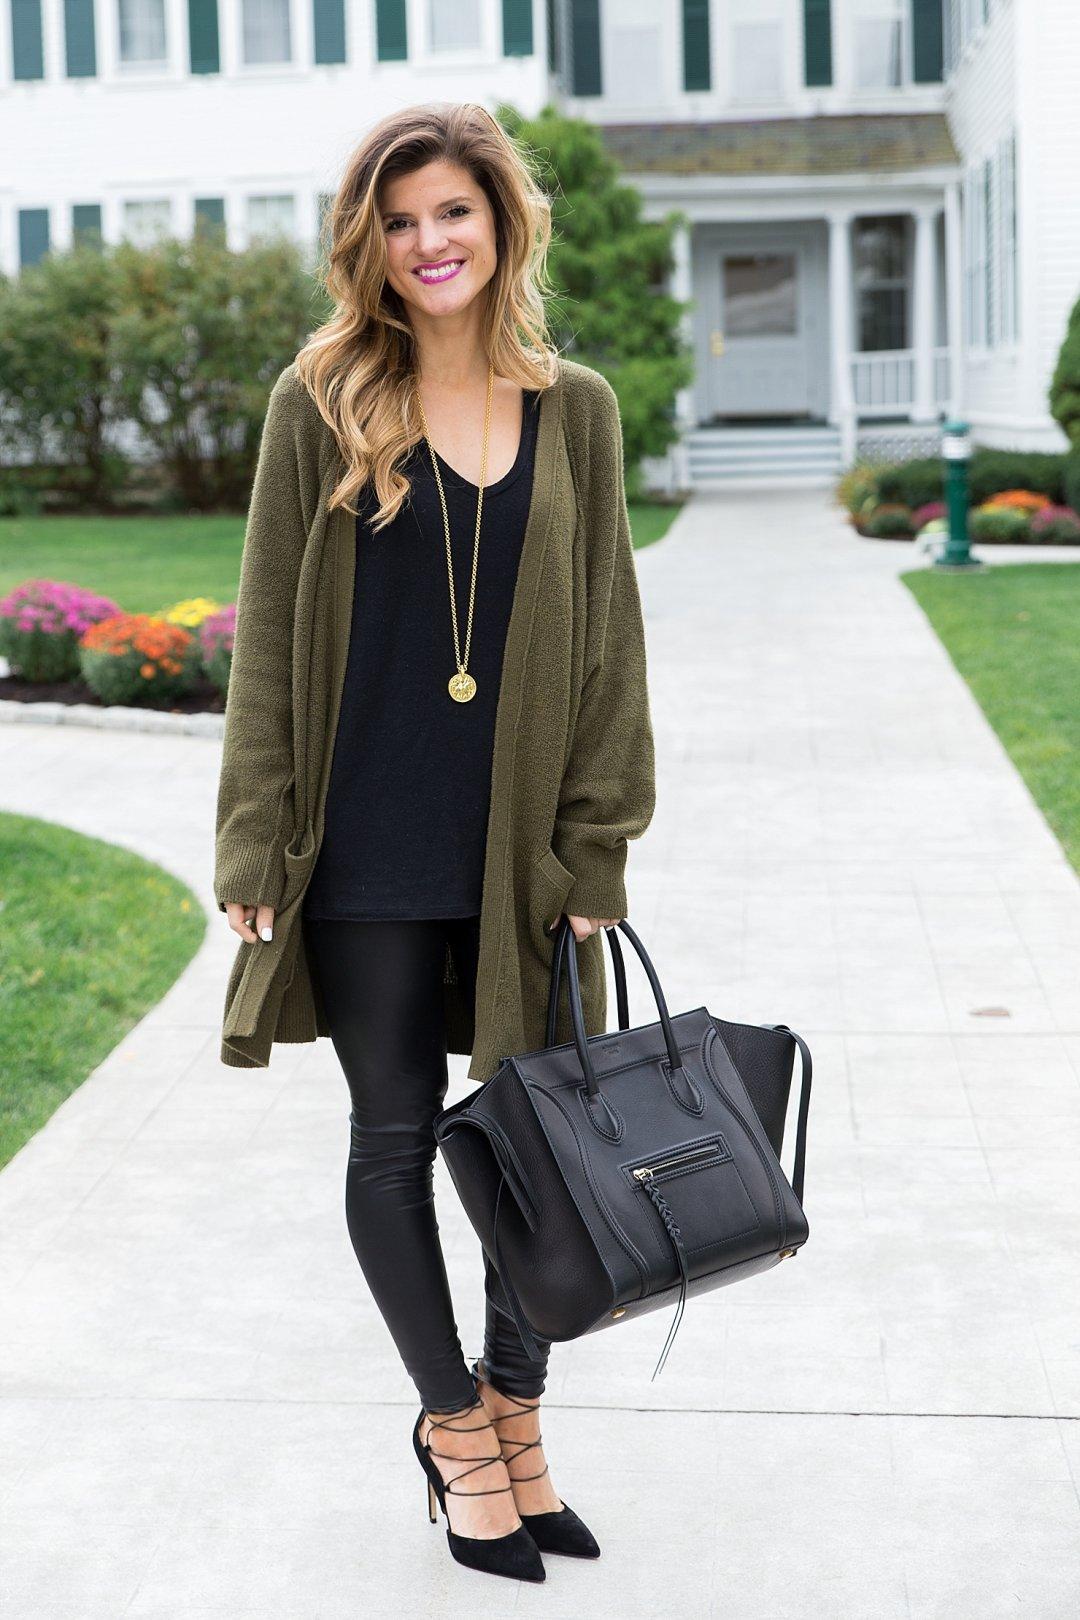 Olive Green Sweater Leather Leggings Black Tunic Golid